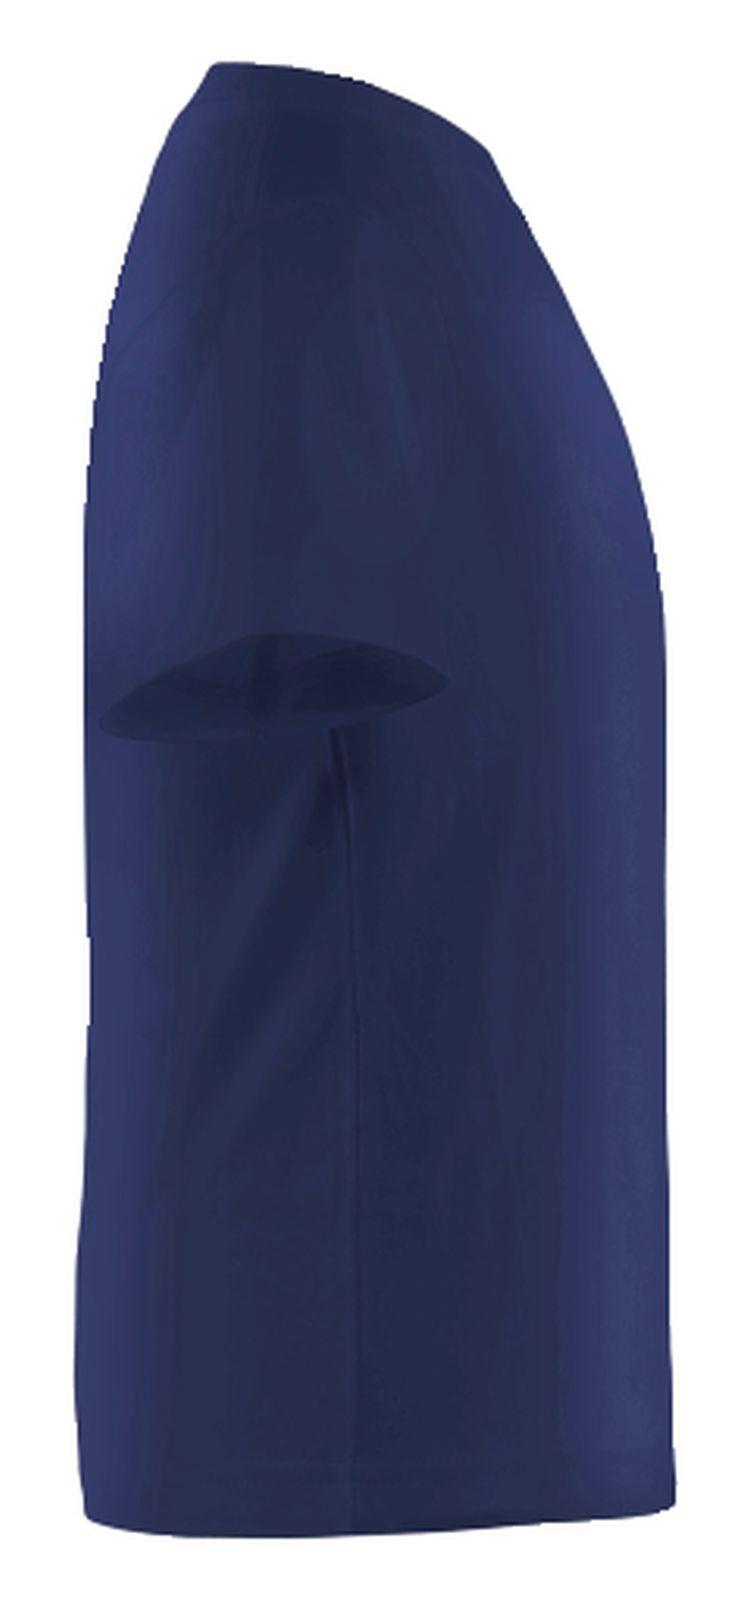 Blaklader Kinderkleding 88021030 marineblauw(8900)